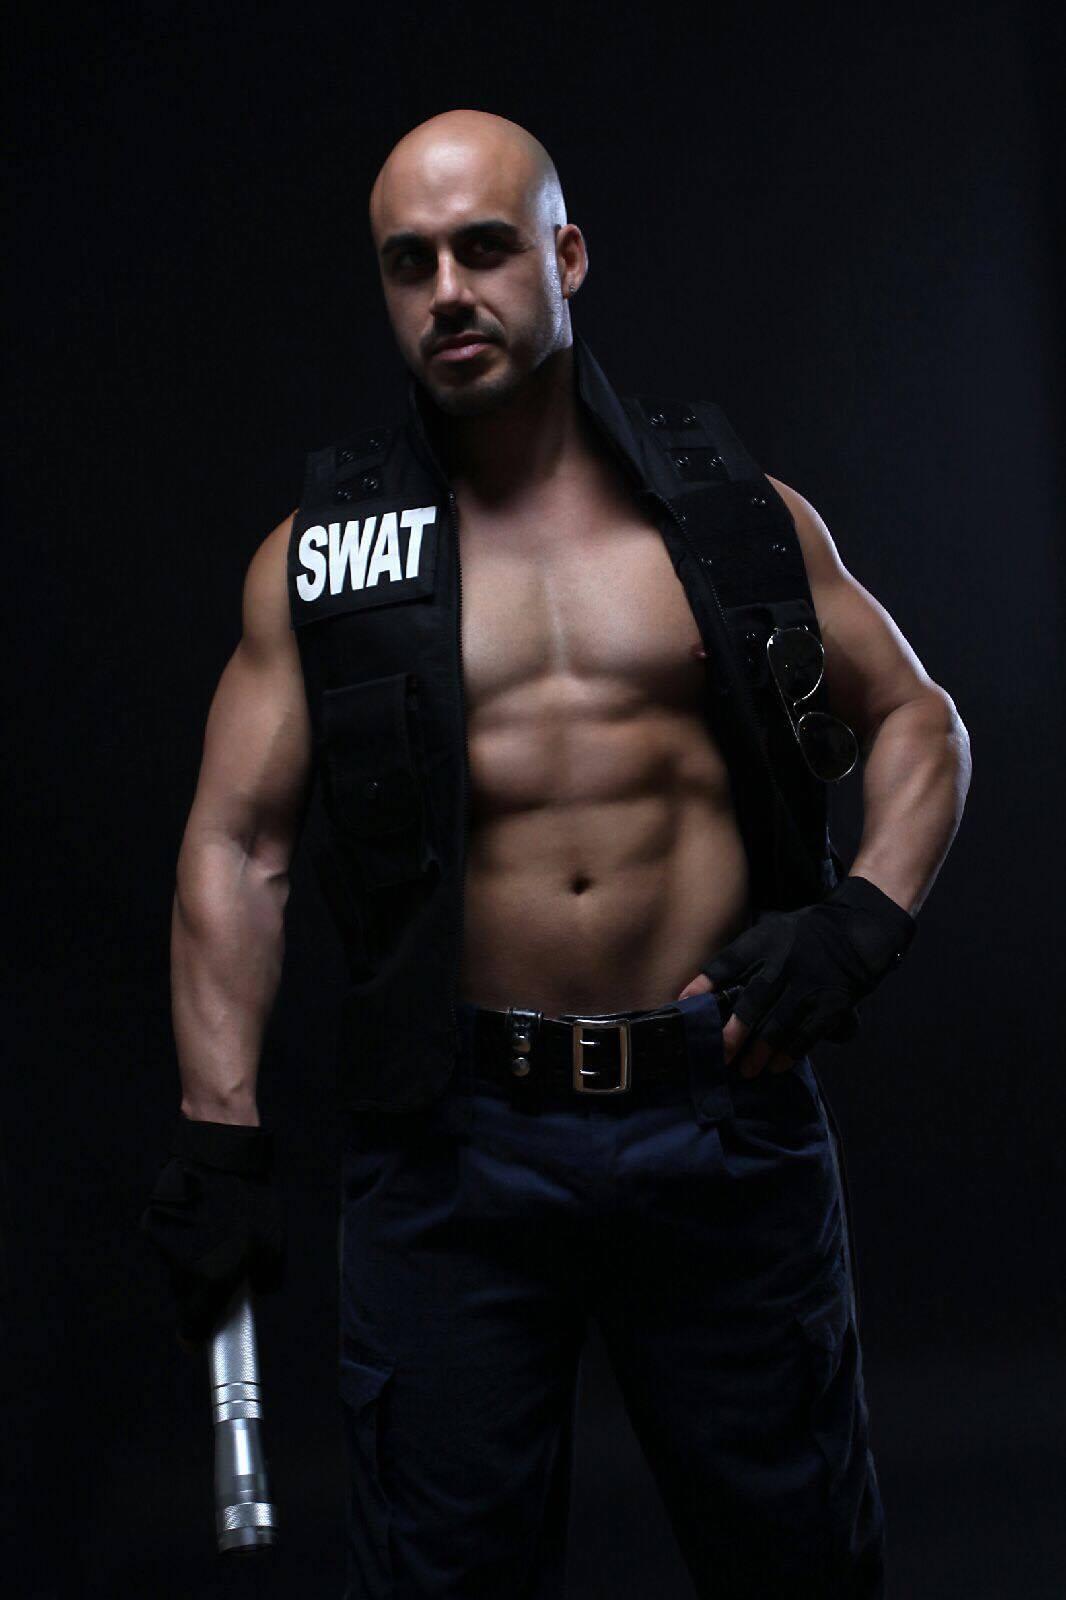 Robert stripper in Sydney